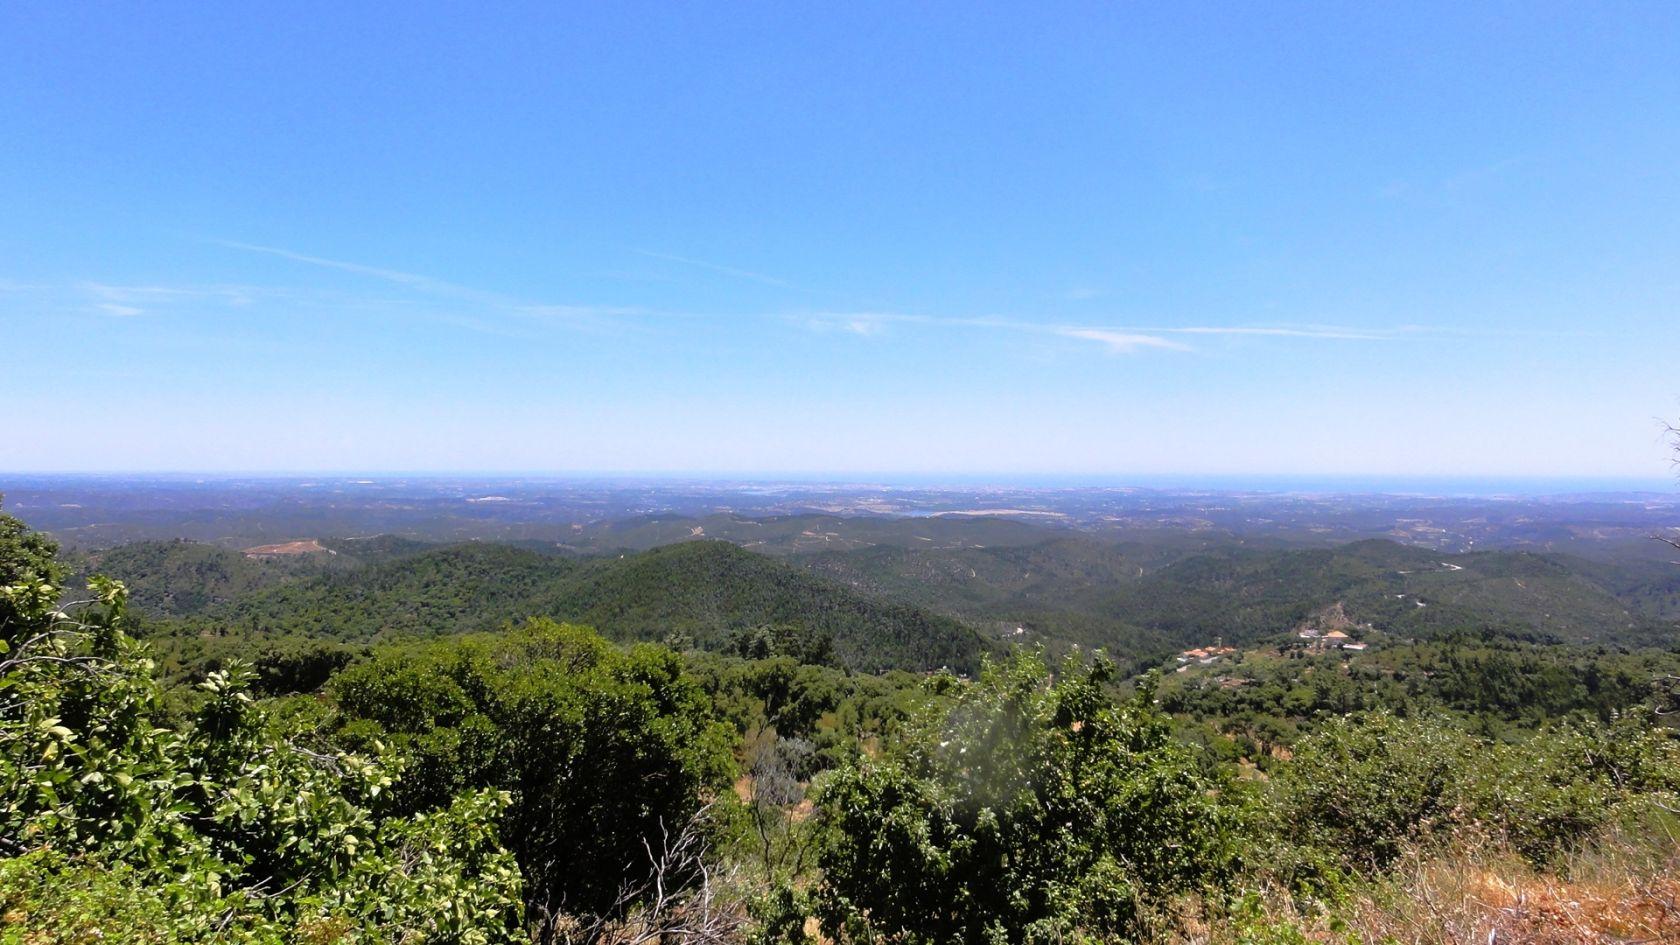 The Beatiful Serra de Monchique